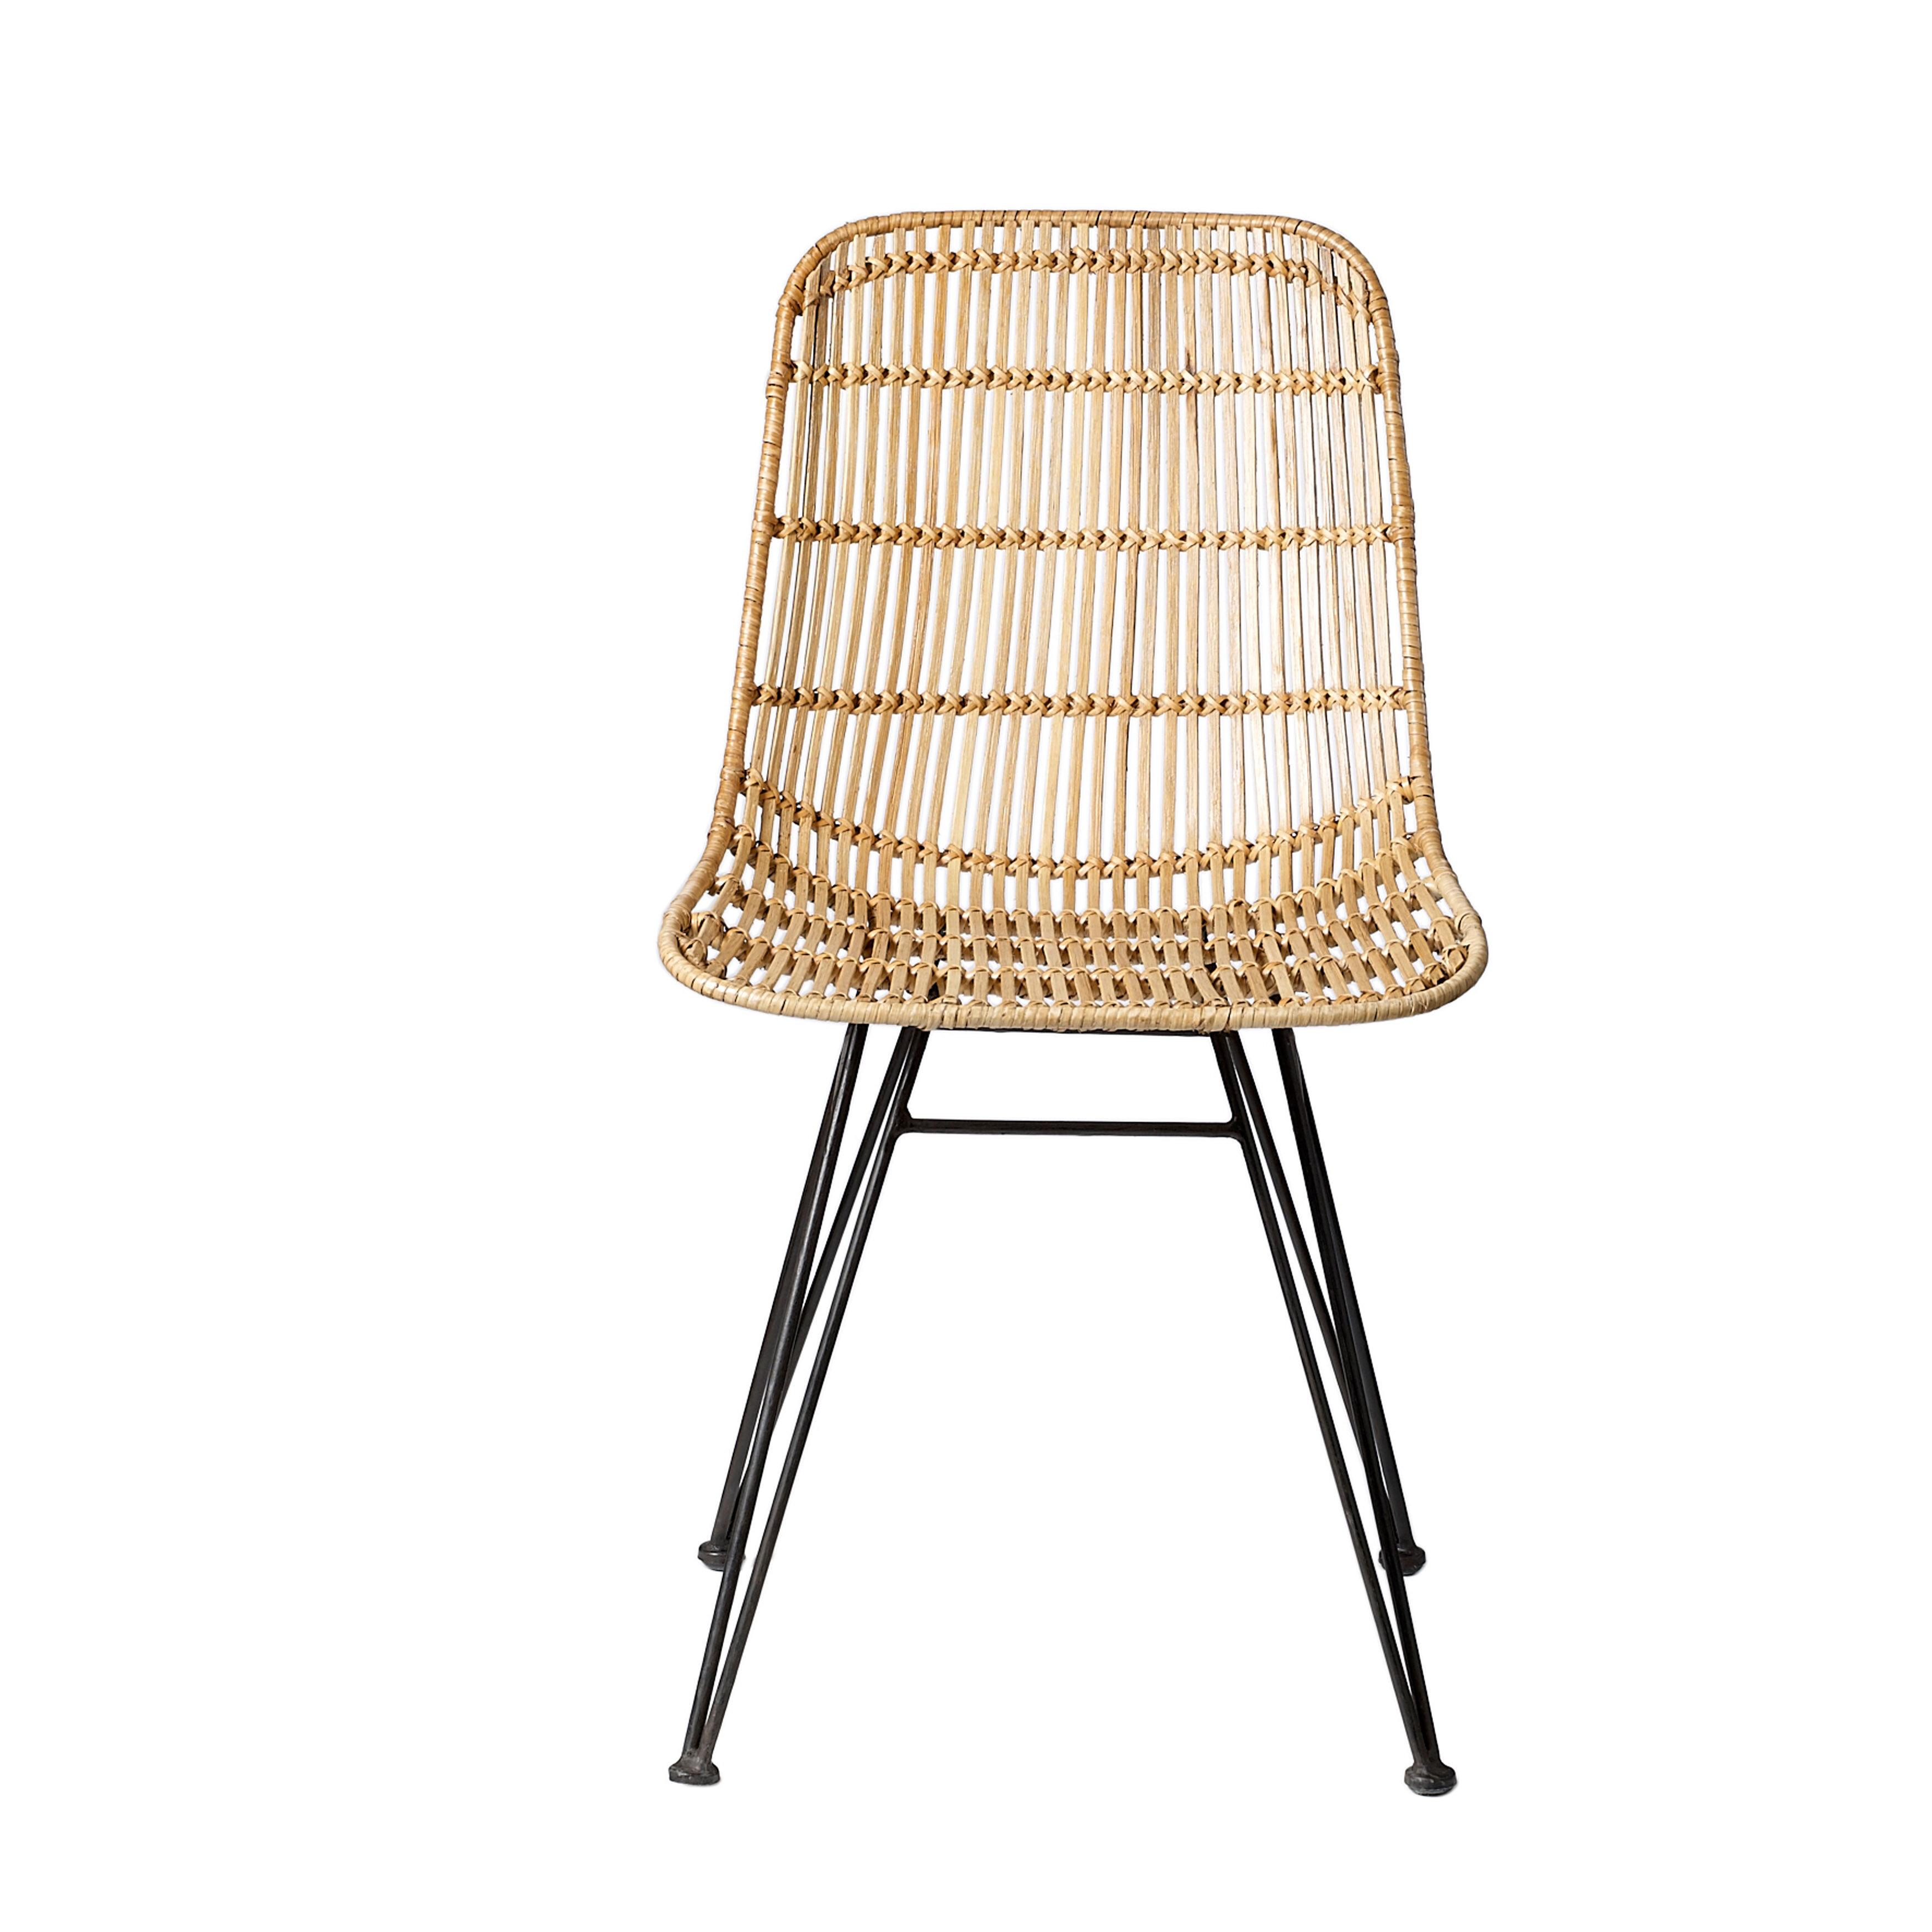 Pleasing Mistana Edmond Side Chair Machost Co Dining Chair Design Ideas Machostcouk